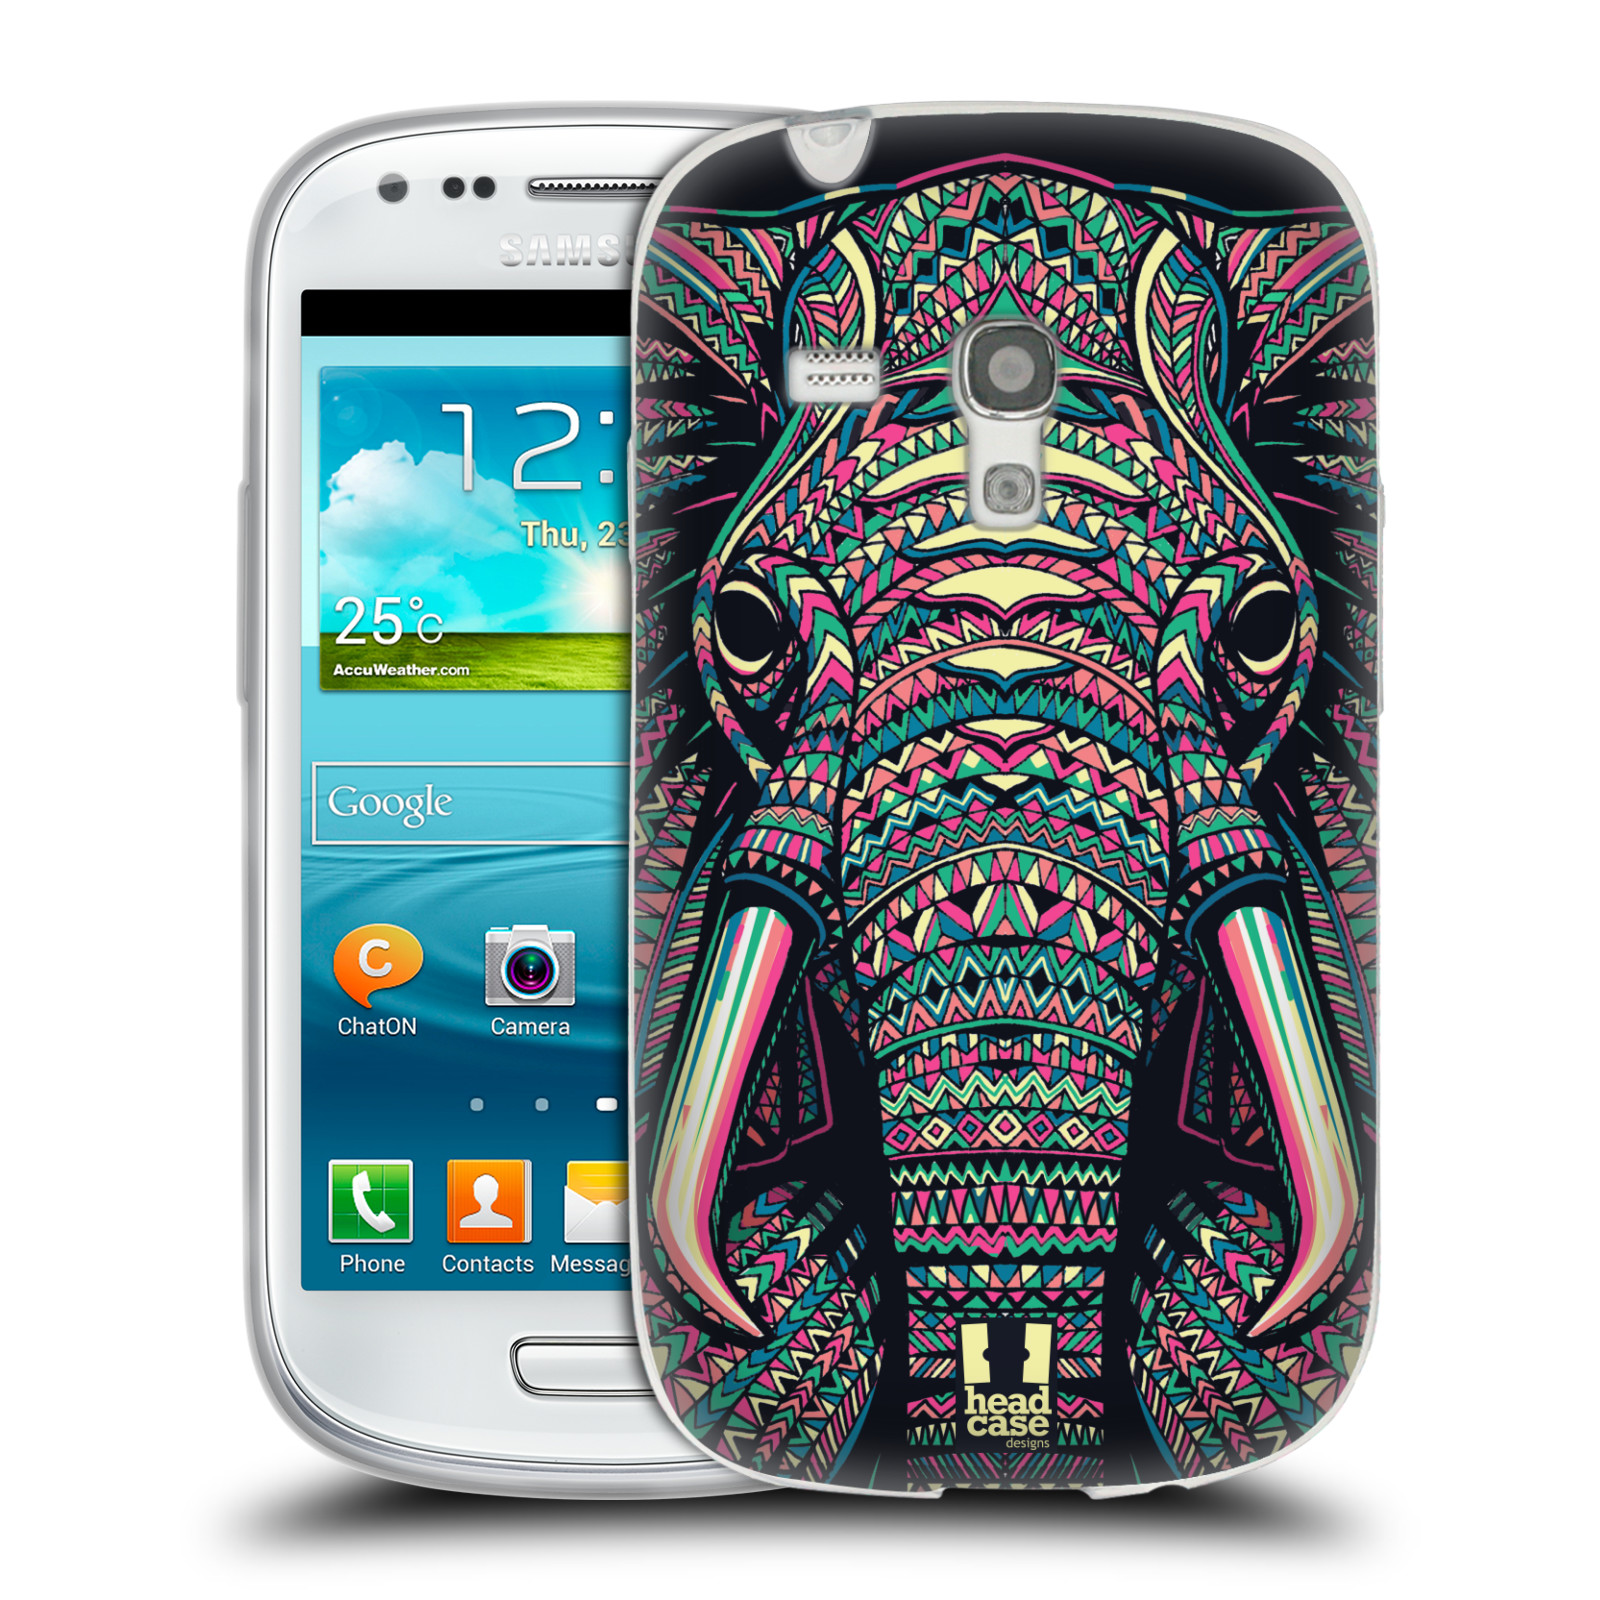 HEAD CASE silikonový obal na mobil Samsung Galaxy S3 MINI i8190 vzor Aztécký motiv zvíře 2 slon